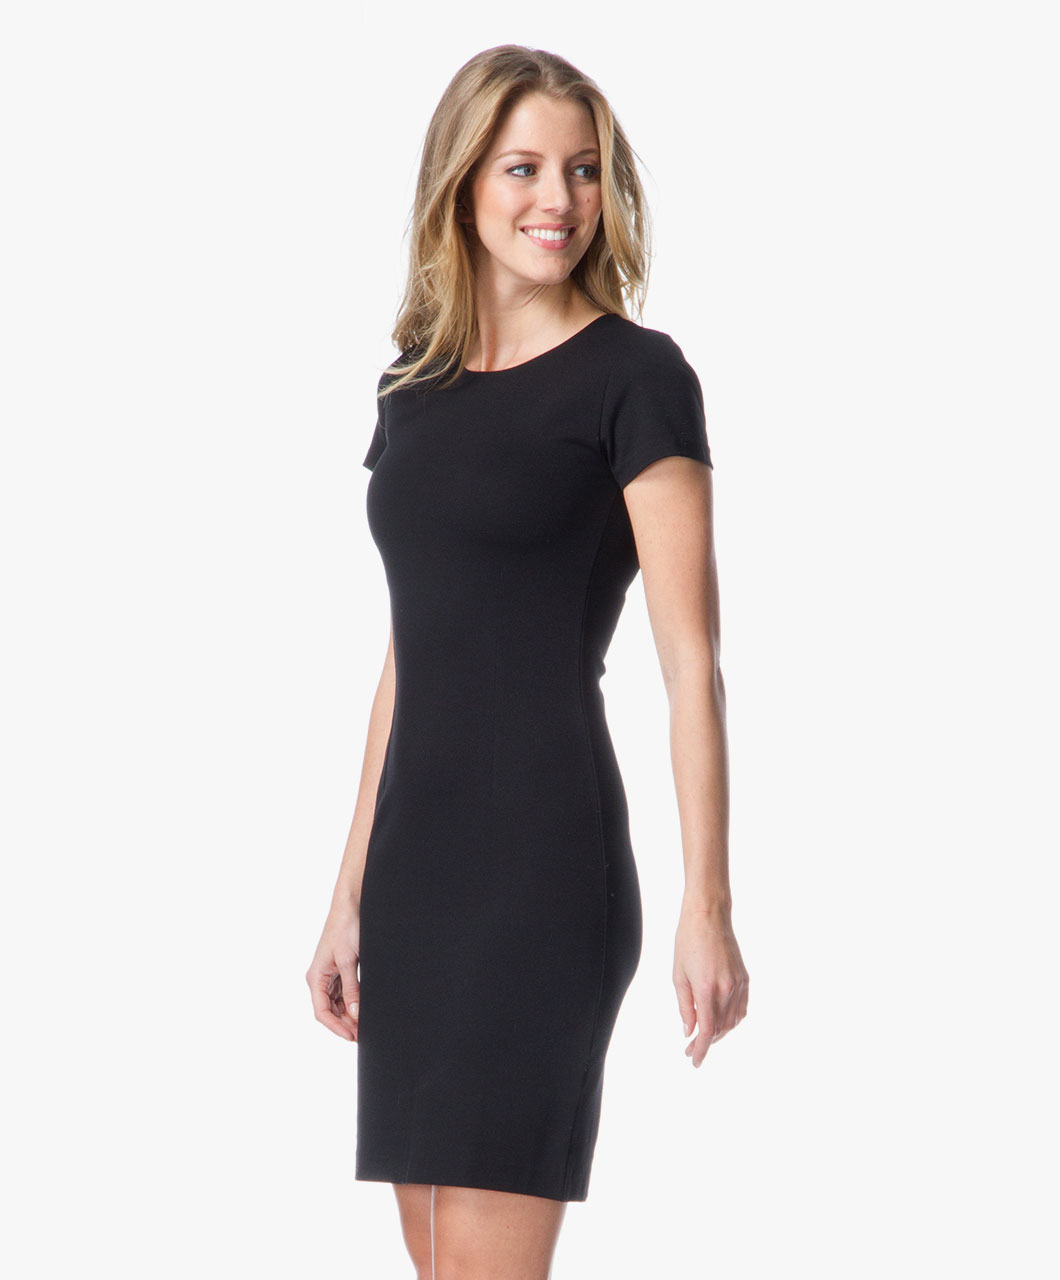 Klassiek Zwart Jurkje.Filippa K Classic Jersey Dress Black Filippa K